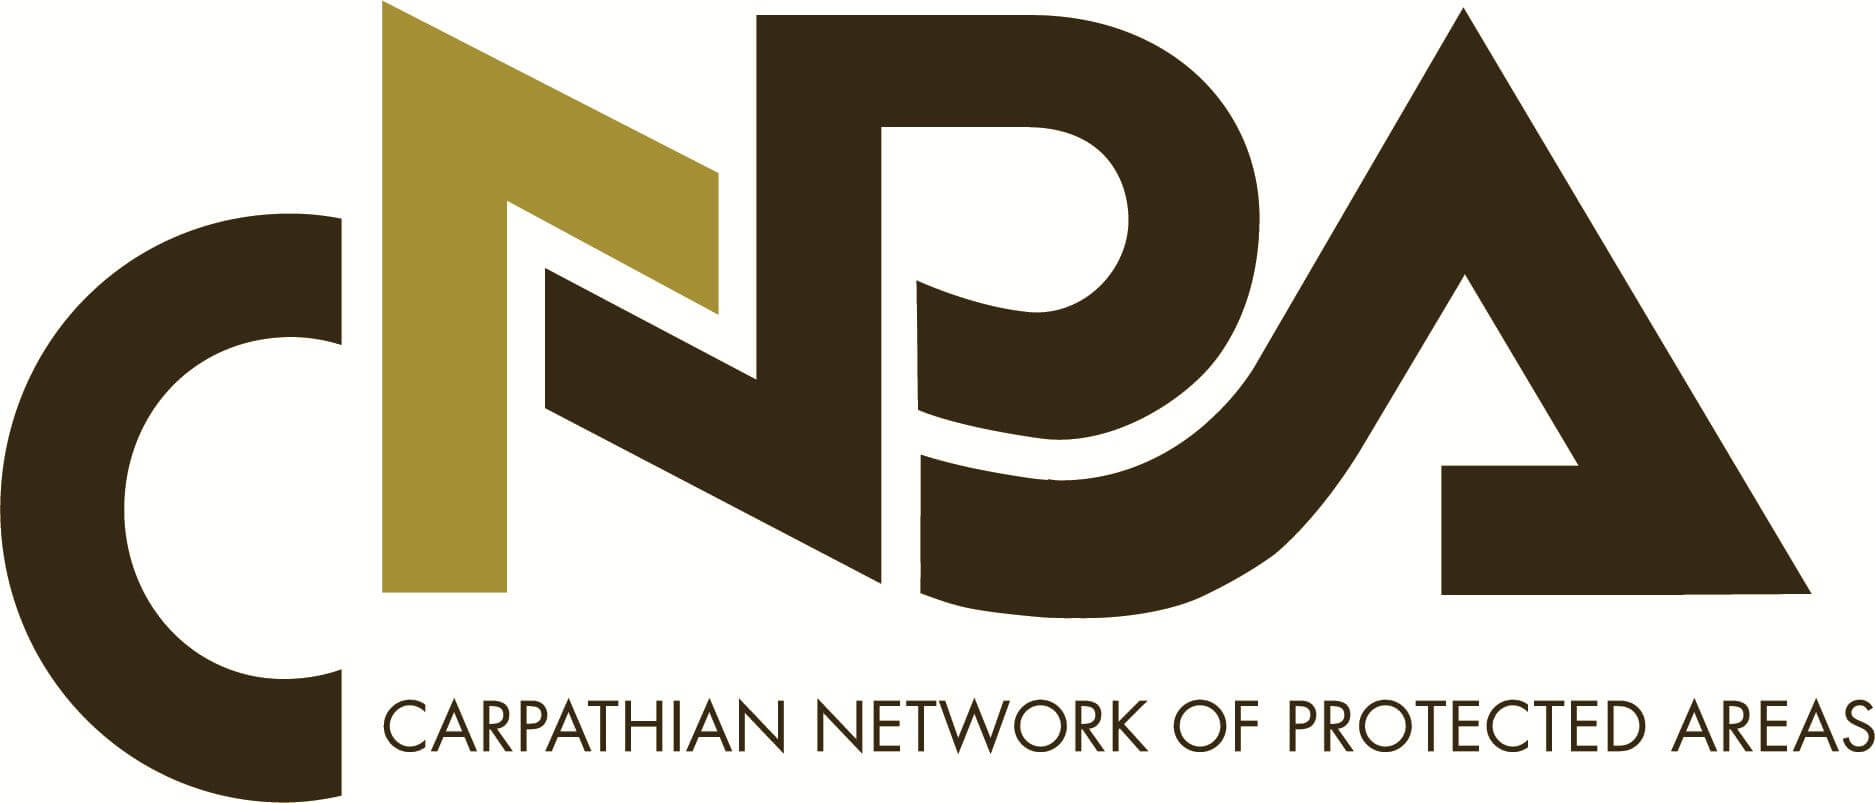 https://www.oete.de/images/logos/cnpa.jpg